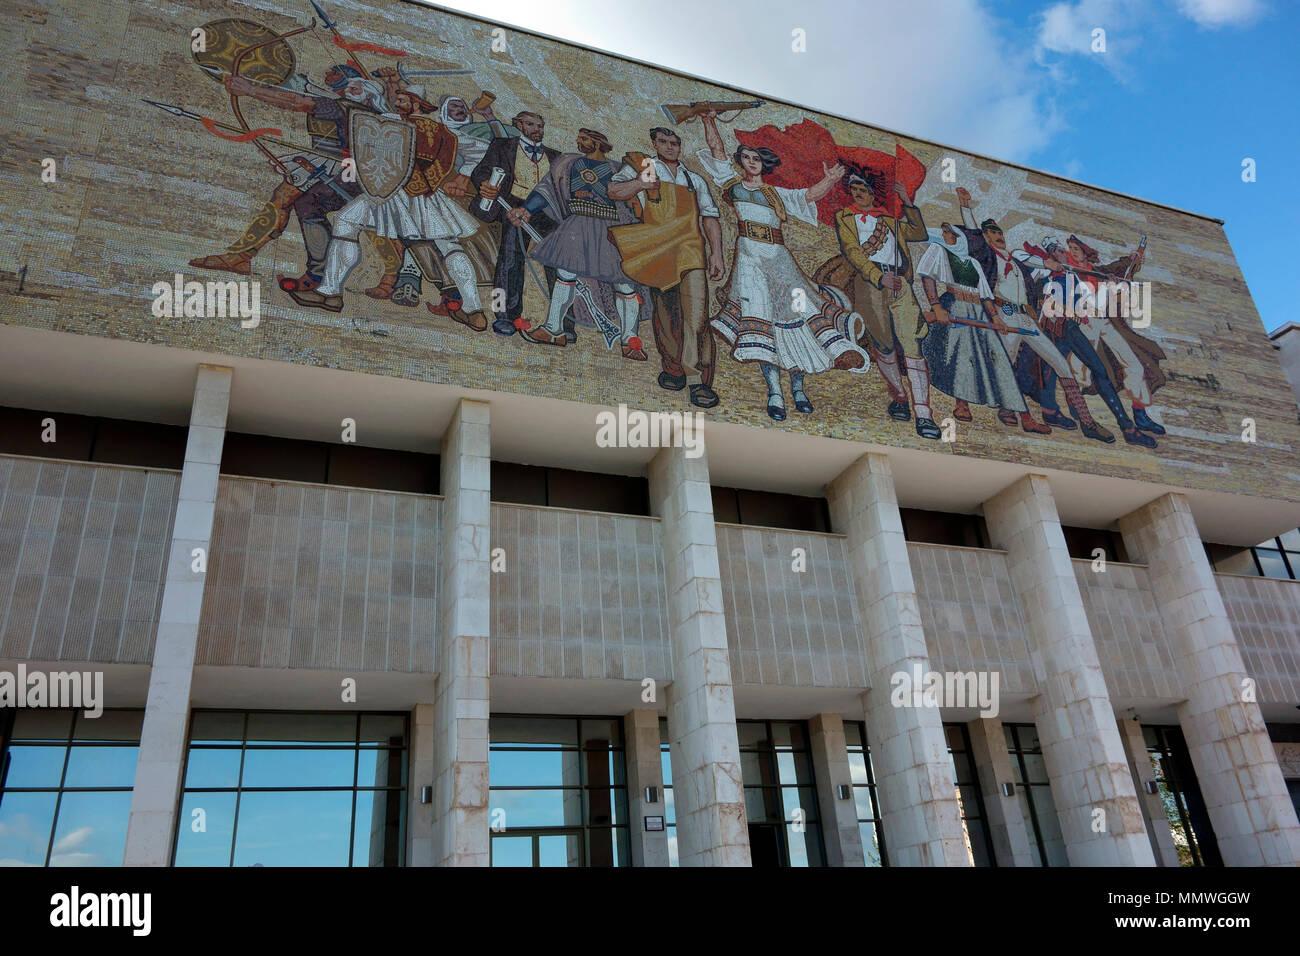 National Museum of History and the Albanian victorious history mosaic on its facade, Tirana, Albania, Balkans - Stock Image